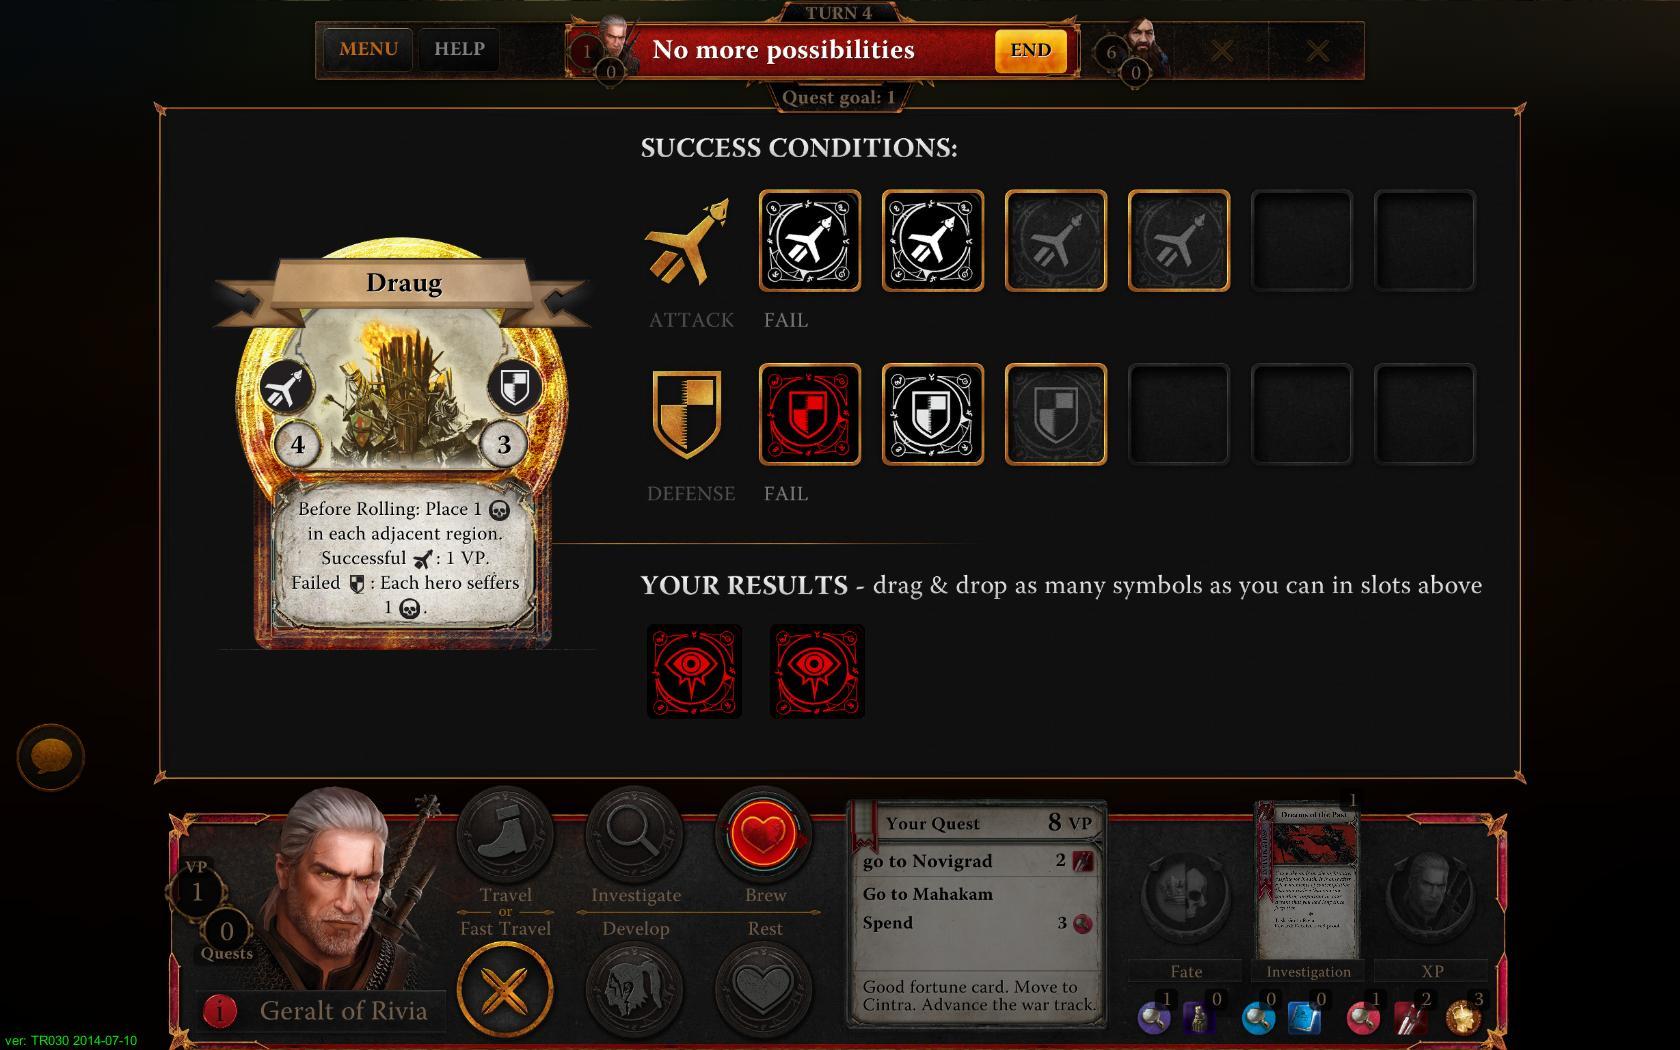 The Witcher: Adventure Game - dojmy z betatestu 98856